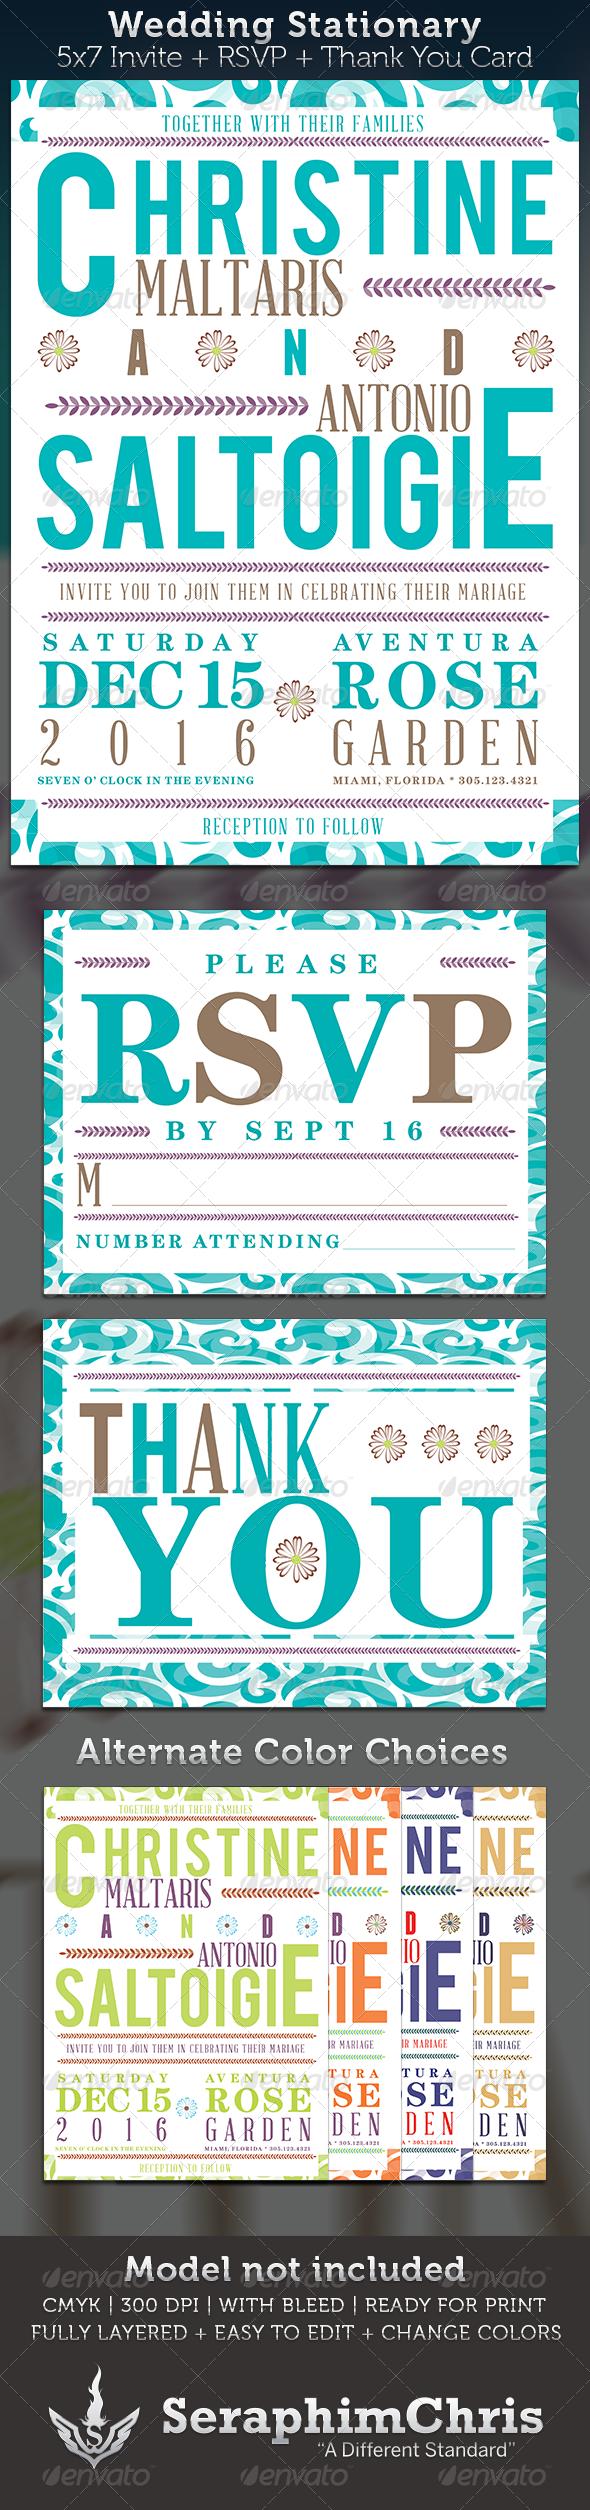 Wedding Invite Stationary Template - Cards & Invites Print Templates